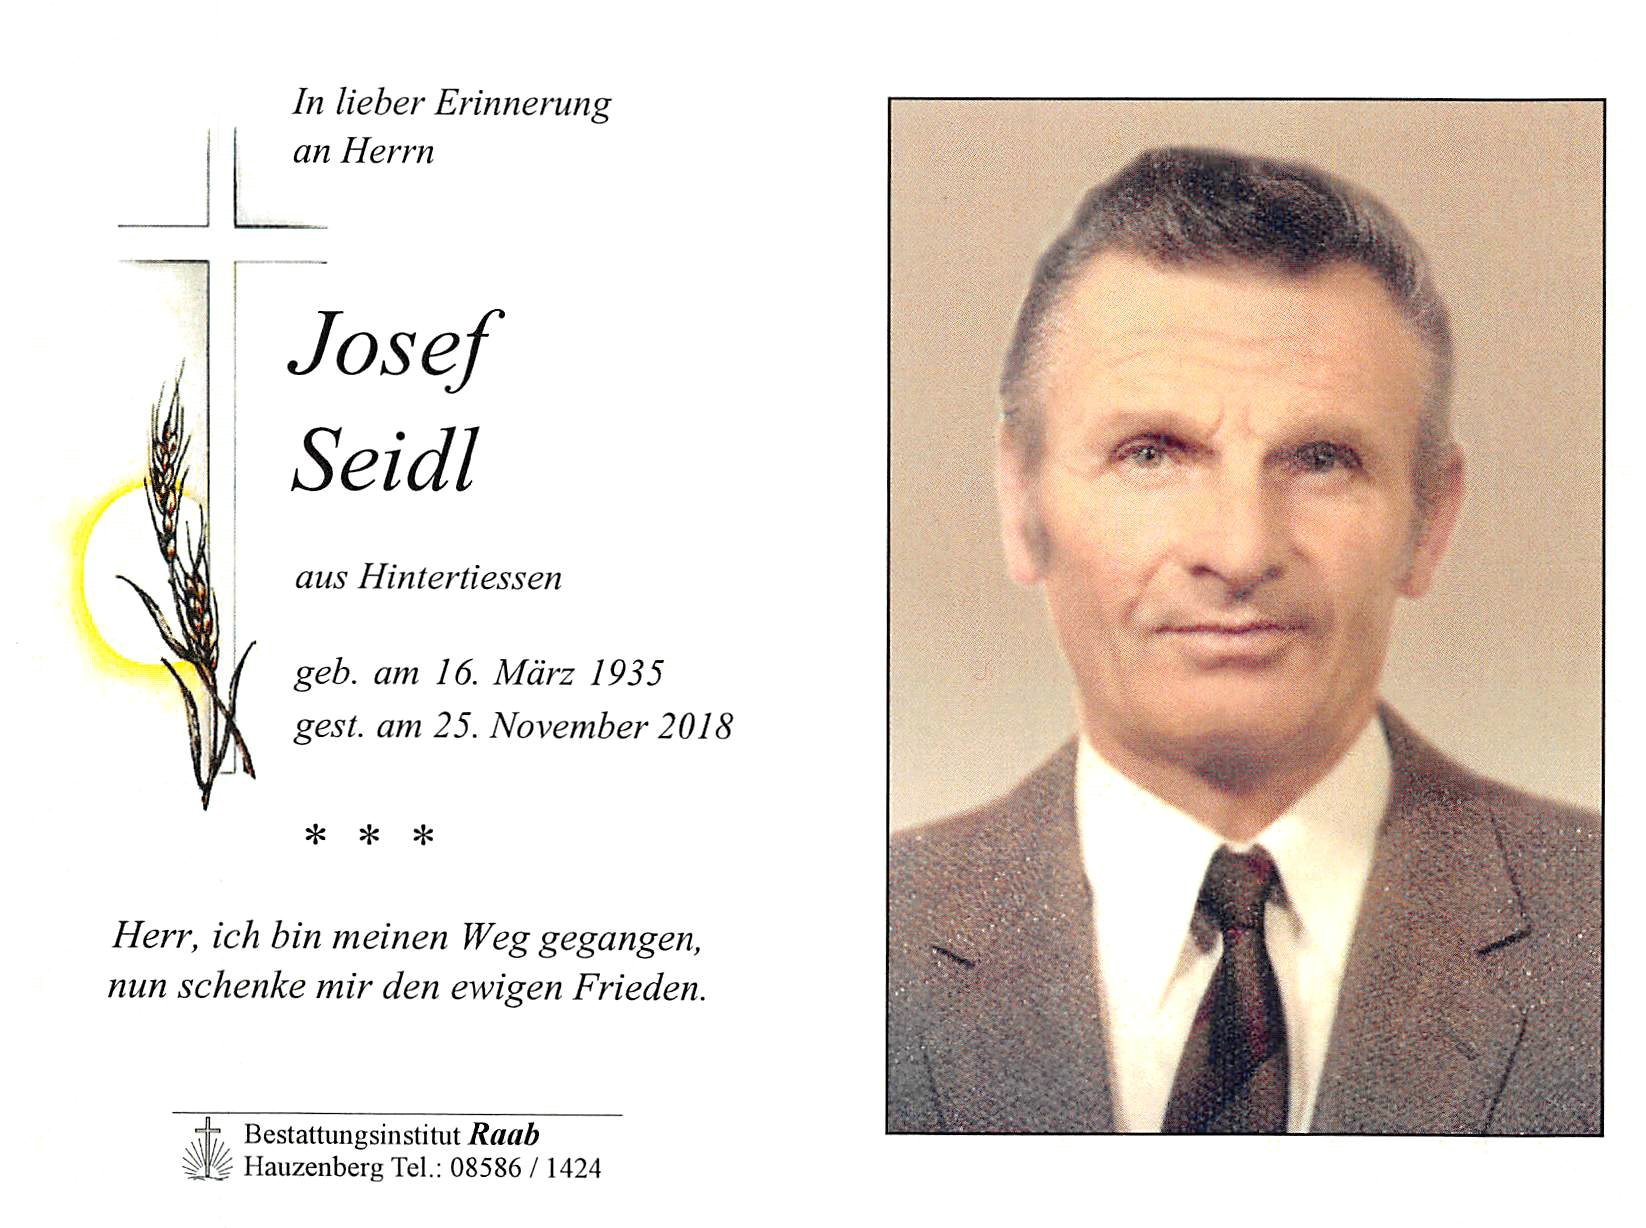 2018-11-25-Seidl-Josef-Hintertiessen